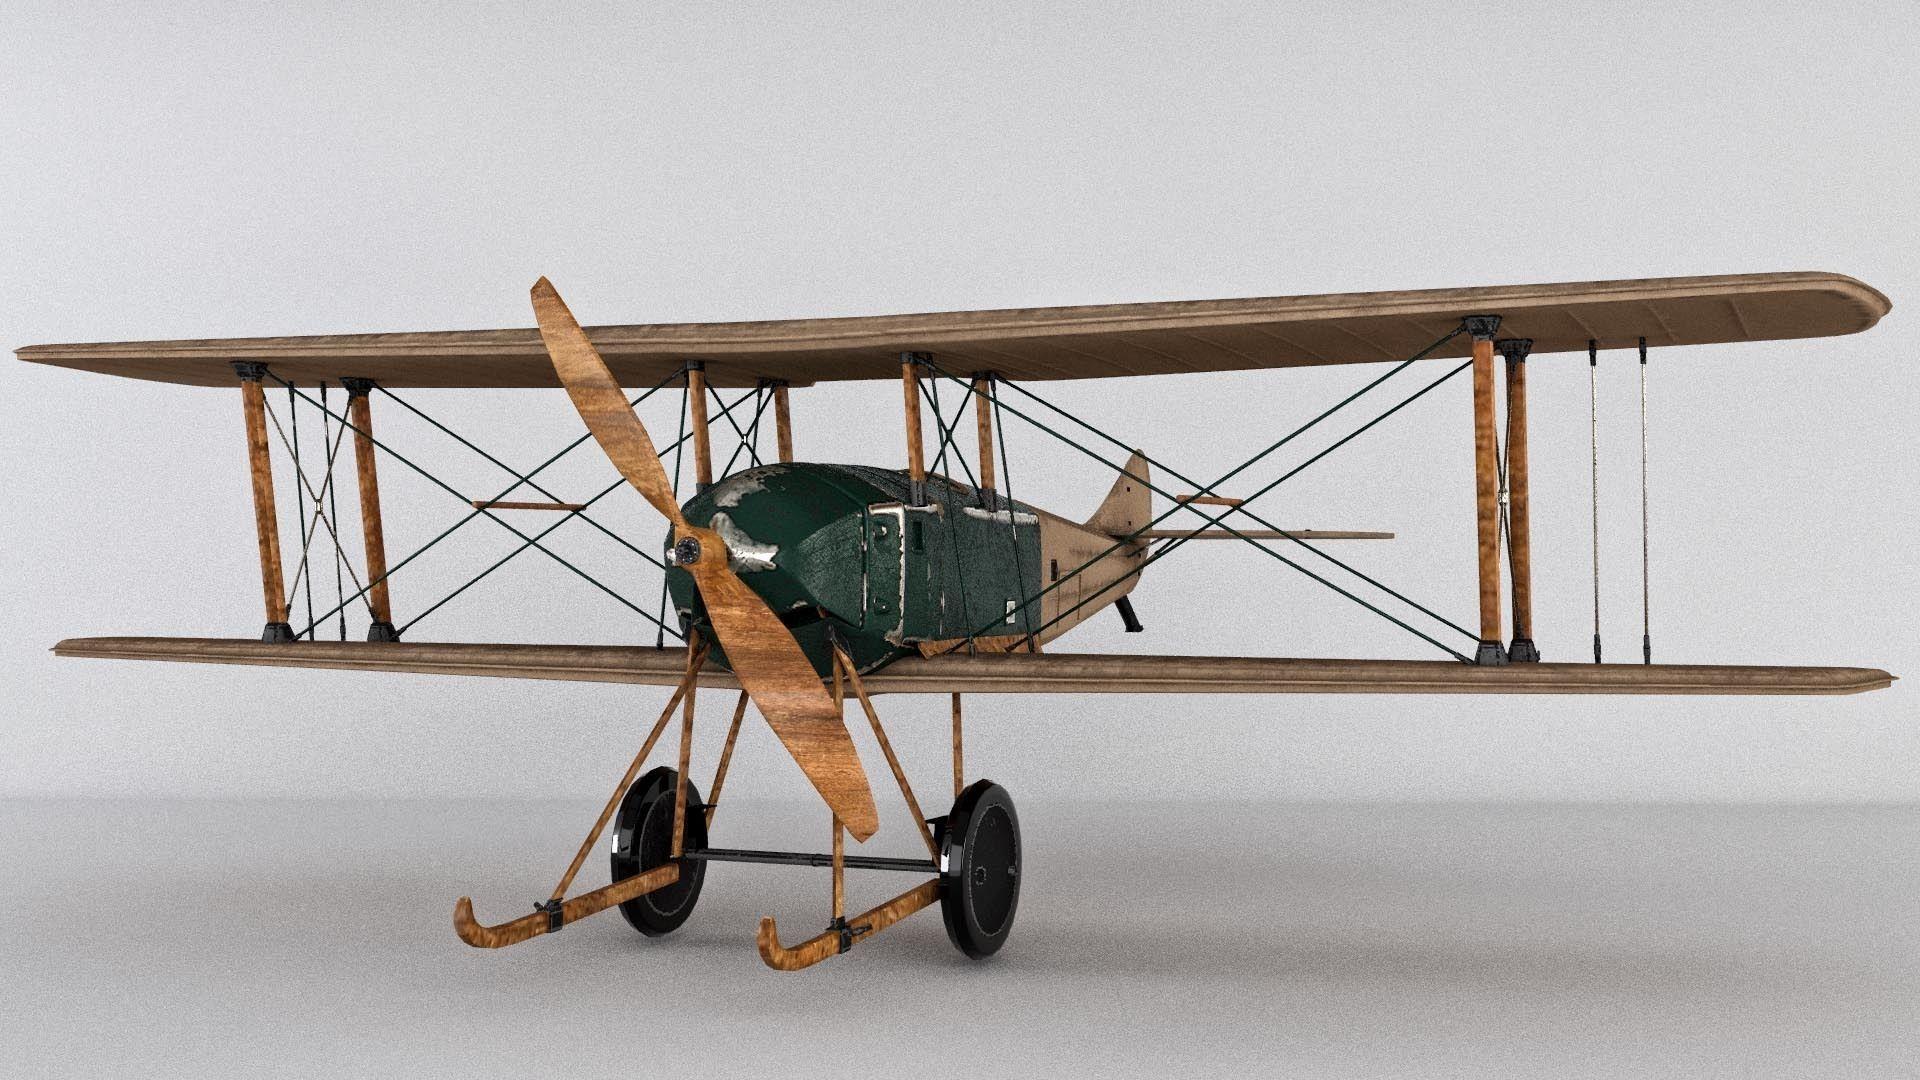 SPAD war Aircraft 3D model